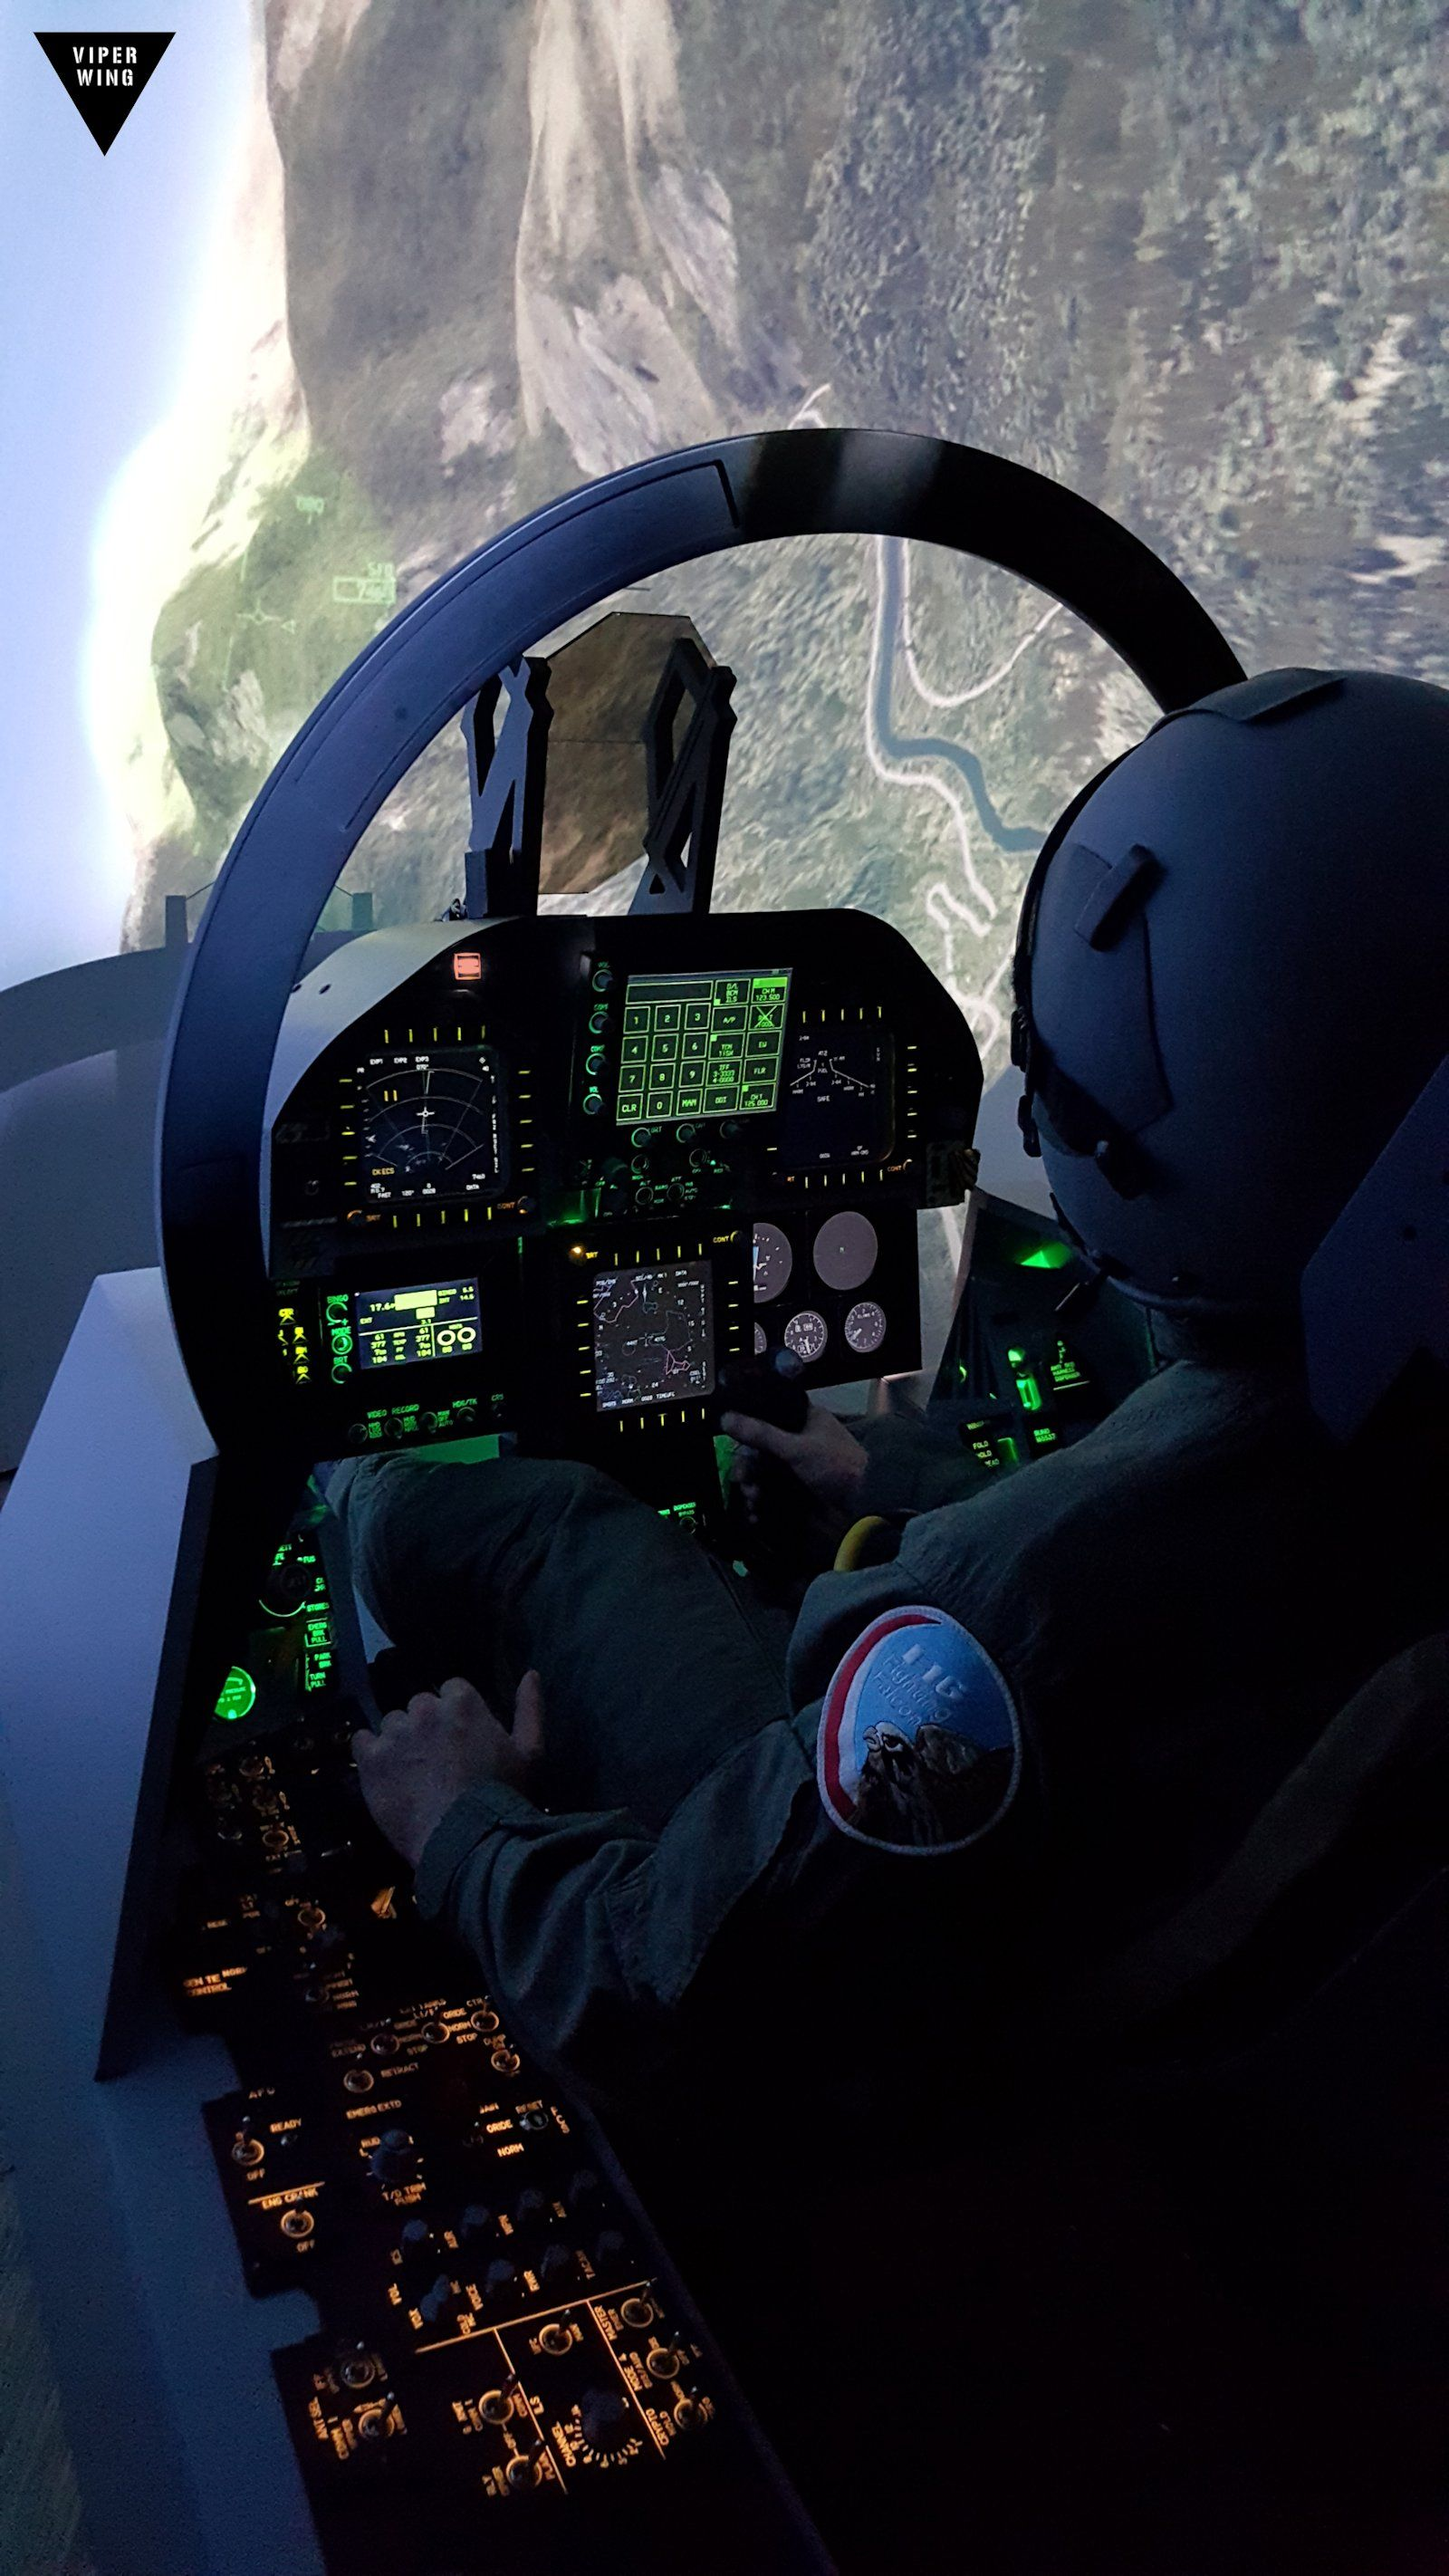 F 18 Simulator Cockpit Superhornet Flight Simulator Cockpit Jet Fighter Pilot Fighter Jets